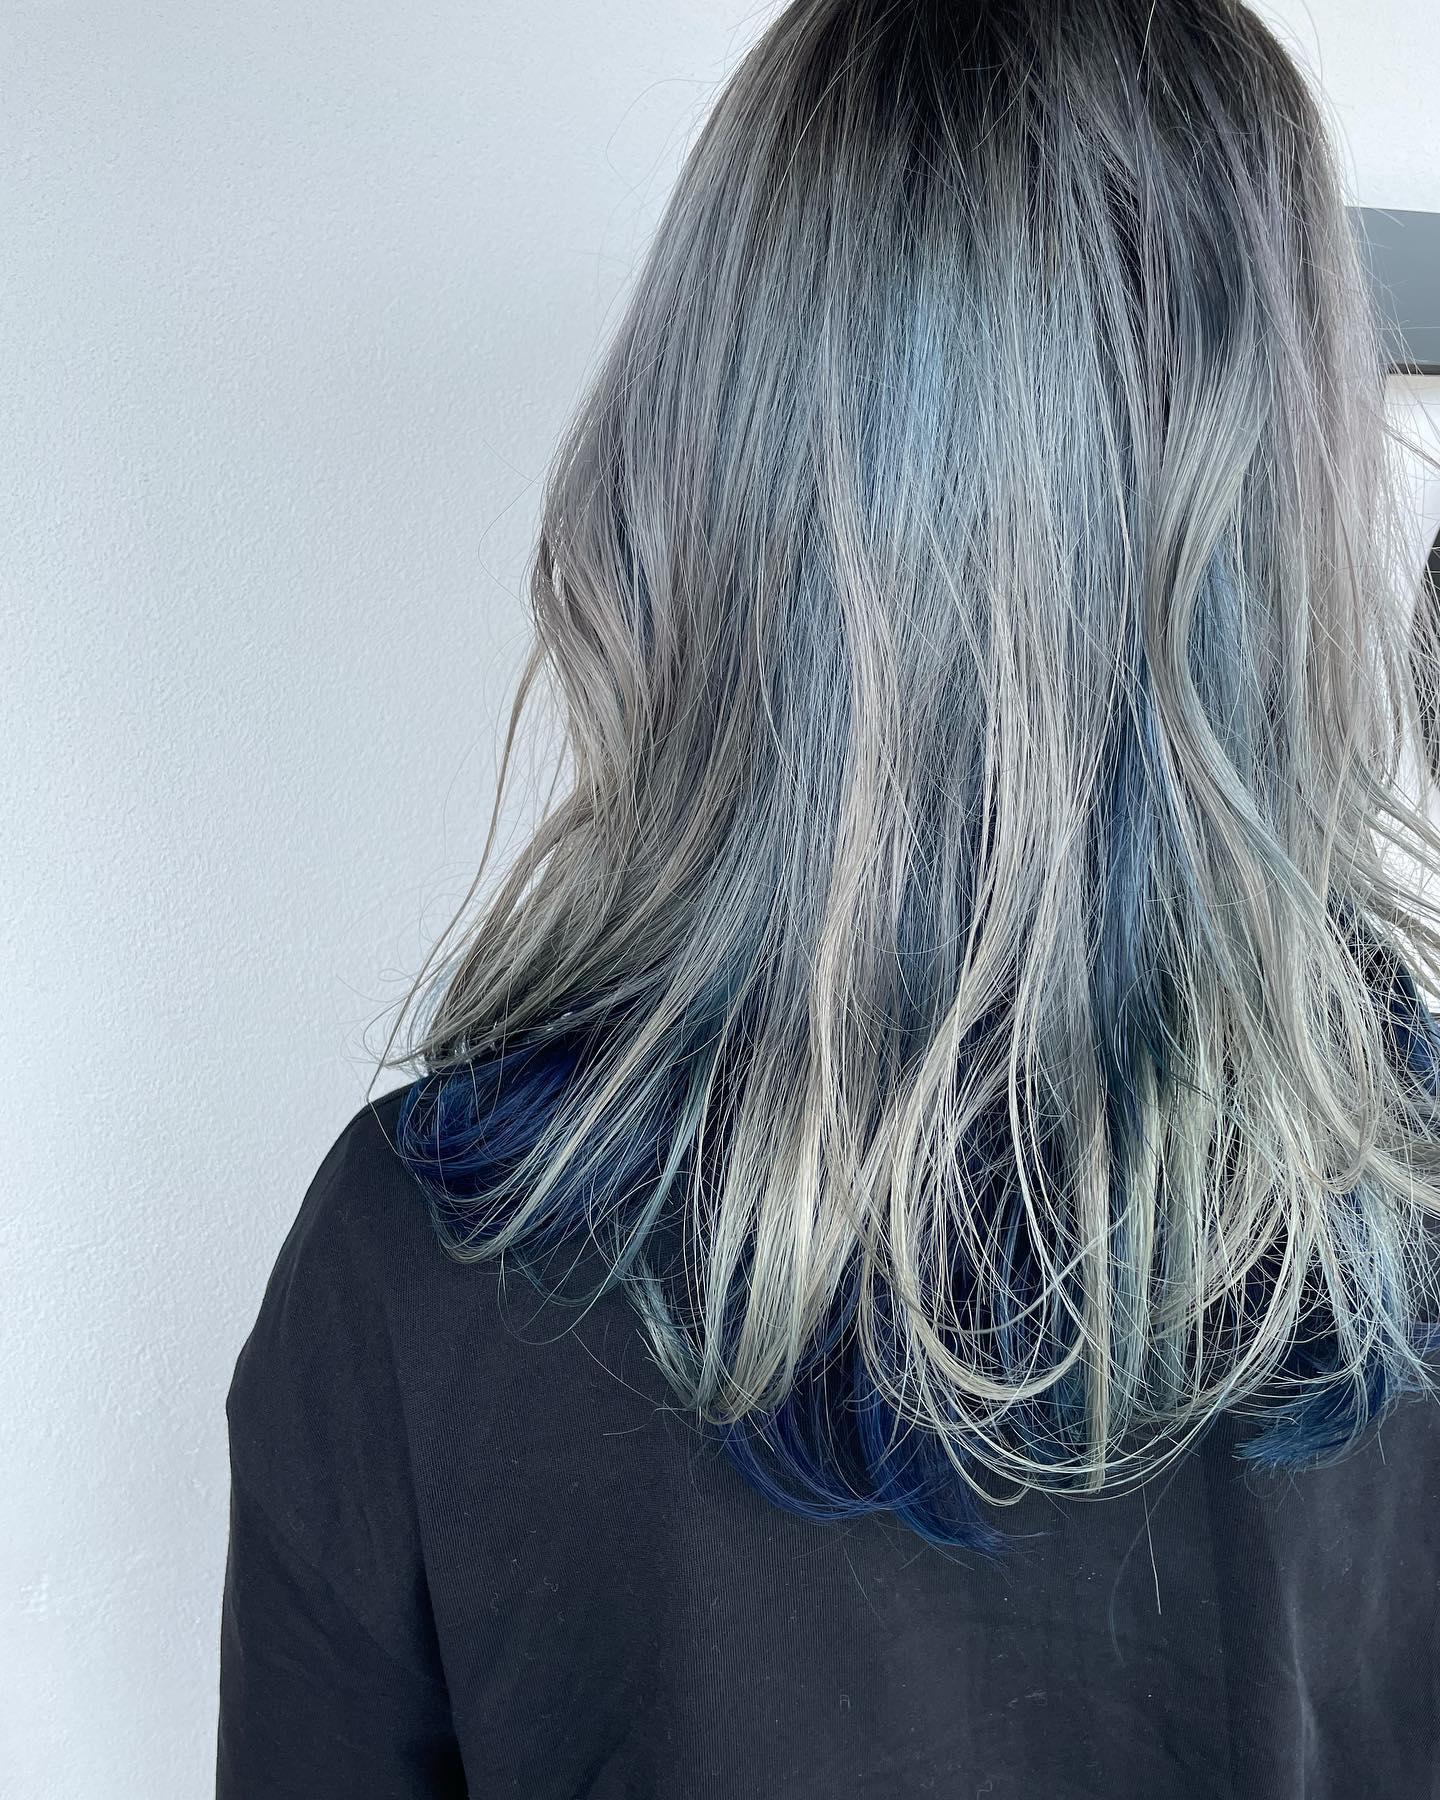 two-tone..#ツートーンカラー #two-tone#blue#silver#ハイトーンカラー..〠627-0004京丹後市峰山町荒山1220-1︎0772608704close:Wednesday